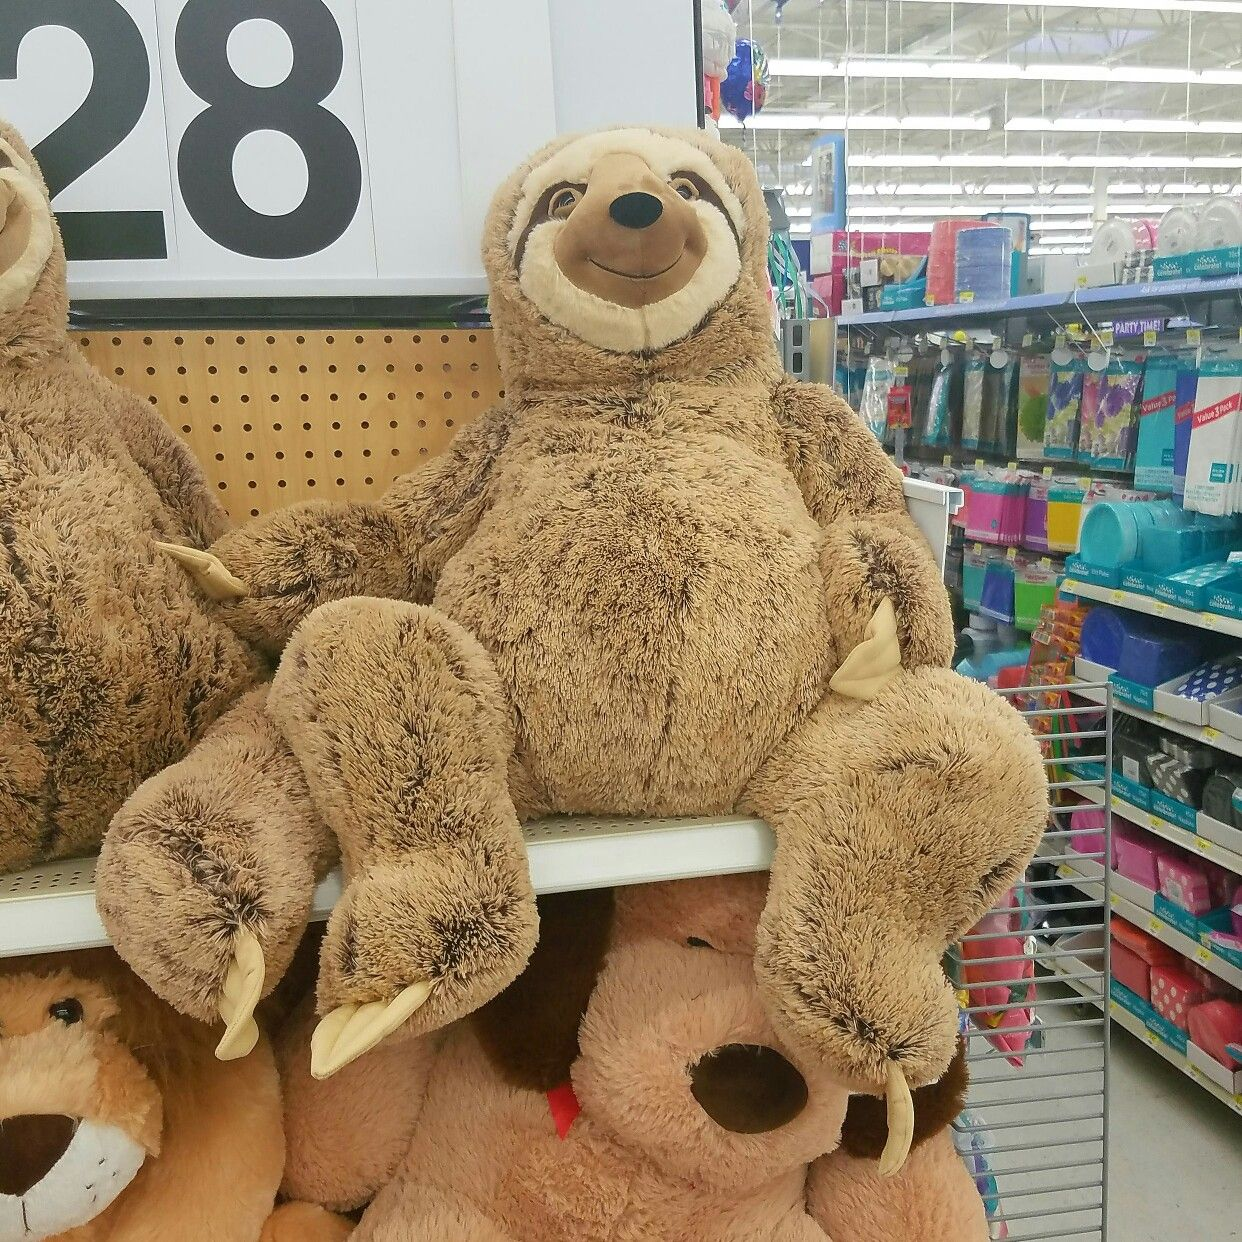 28 Giant Smiling Sloth Sold At Walmart Sloth Stuffed Animal Giant Stuffed Animals Smiling Sloth [ 1242 x 1242 Pixel ]